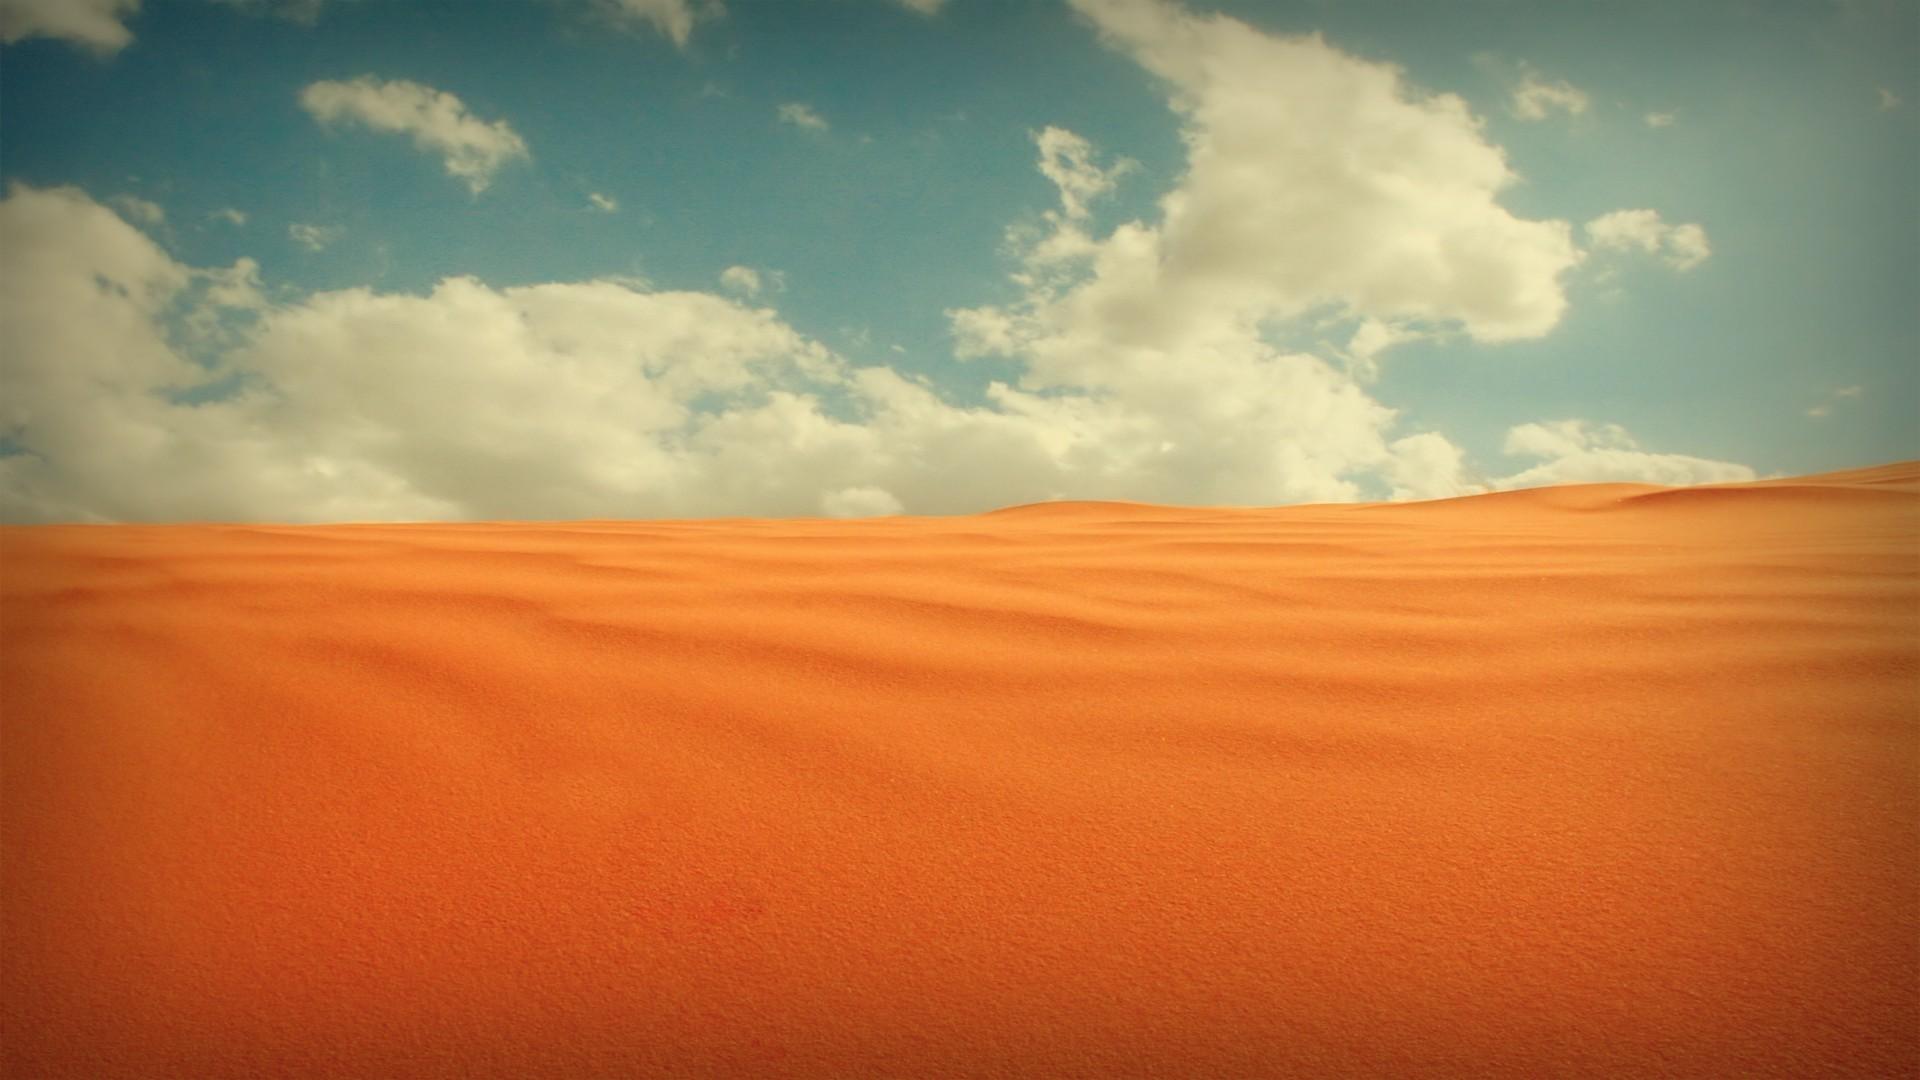 Желтый самолет в пустыне онлайн